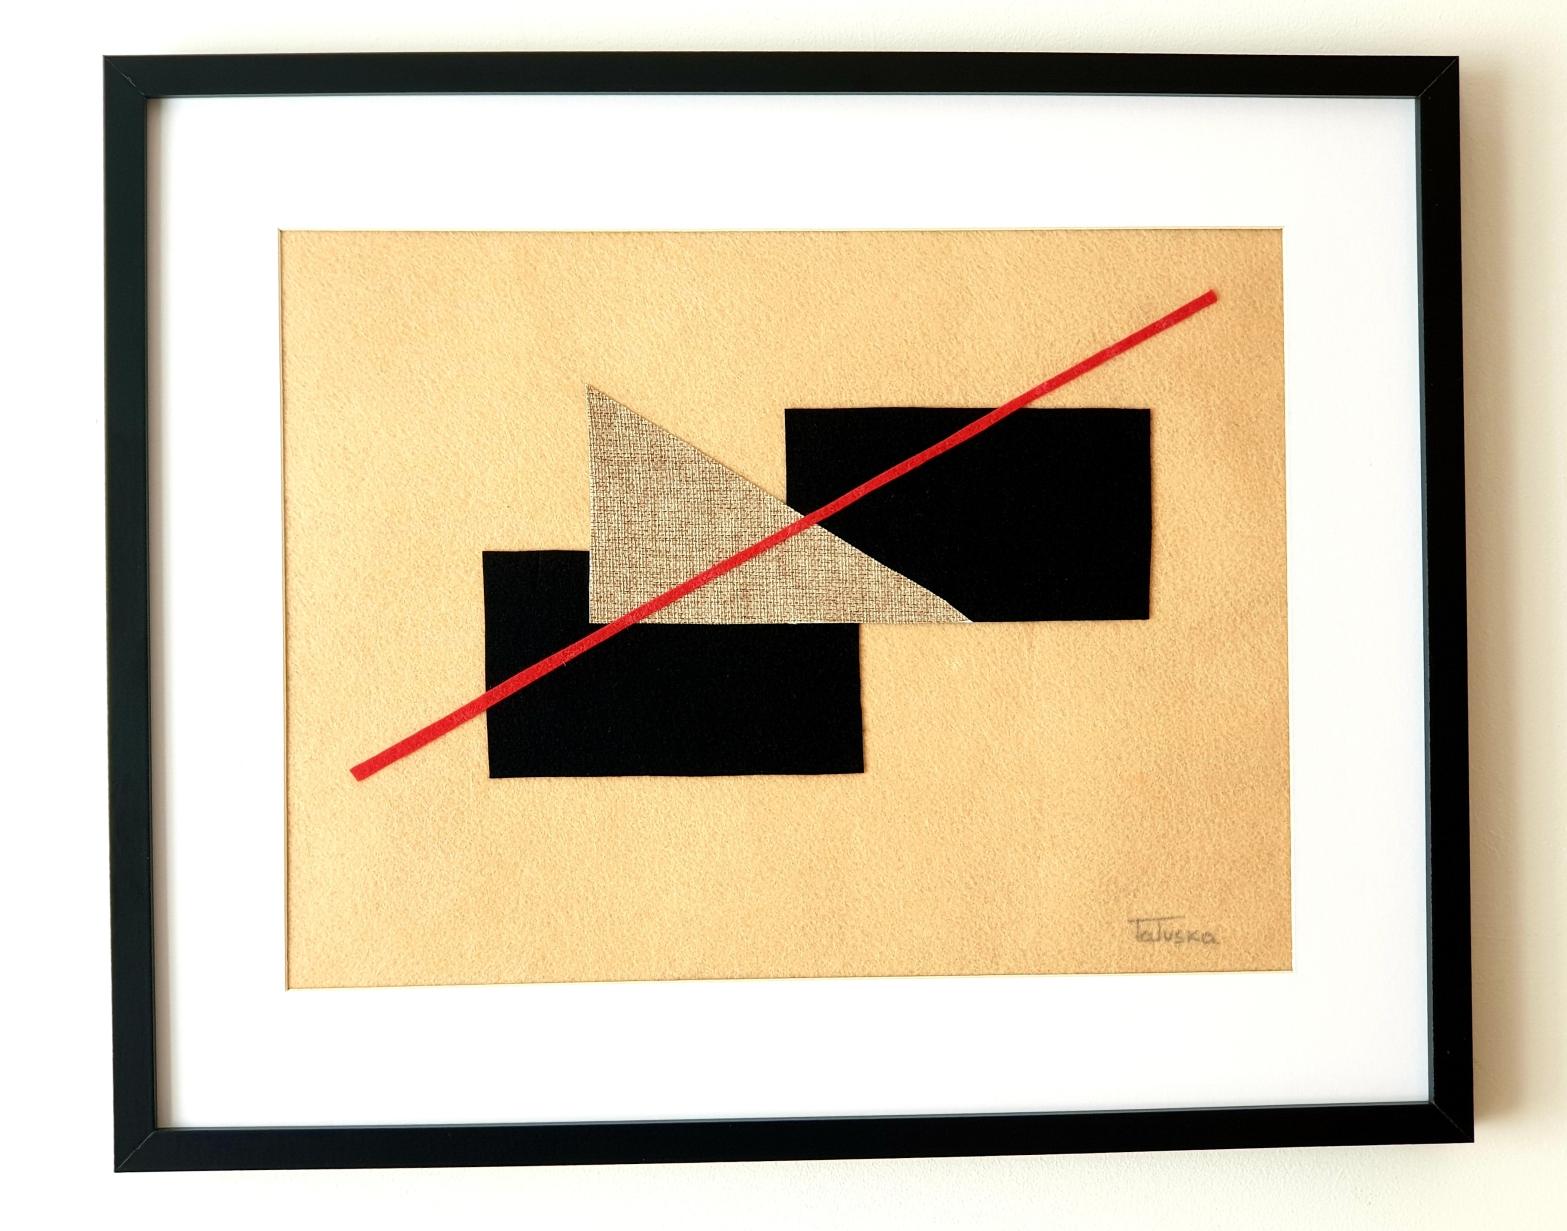 "Cuadro de arte abstracto titulado ""Connecting"" de la artista Tatuska (https://artuska.com)."